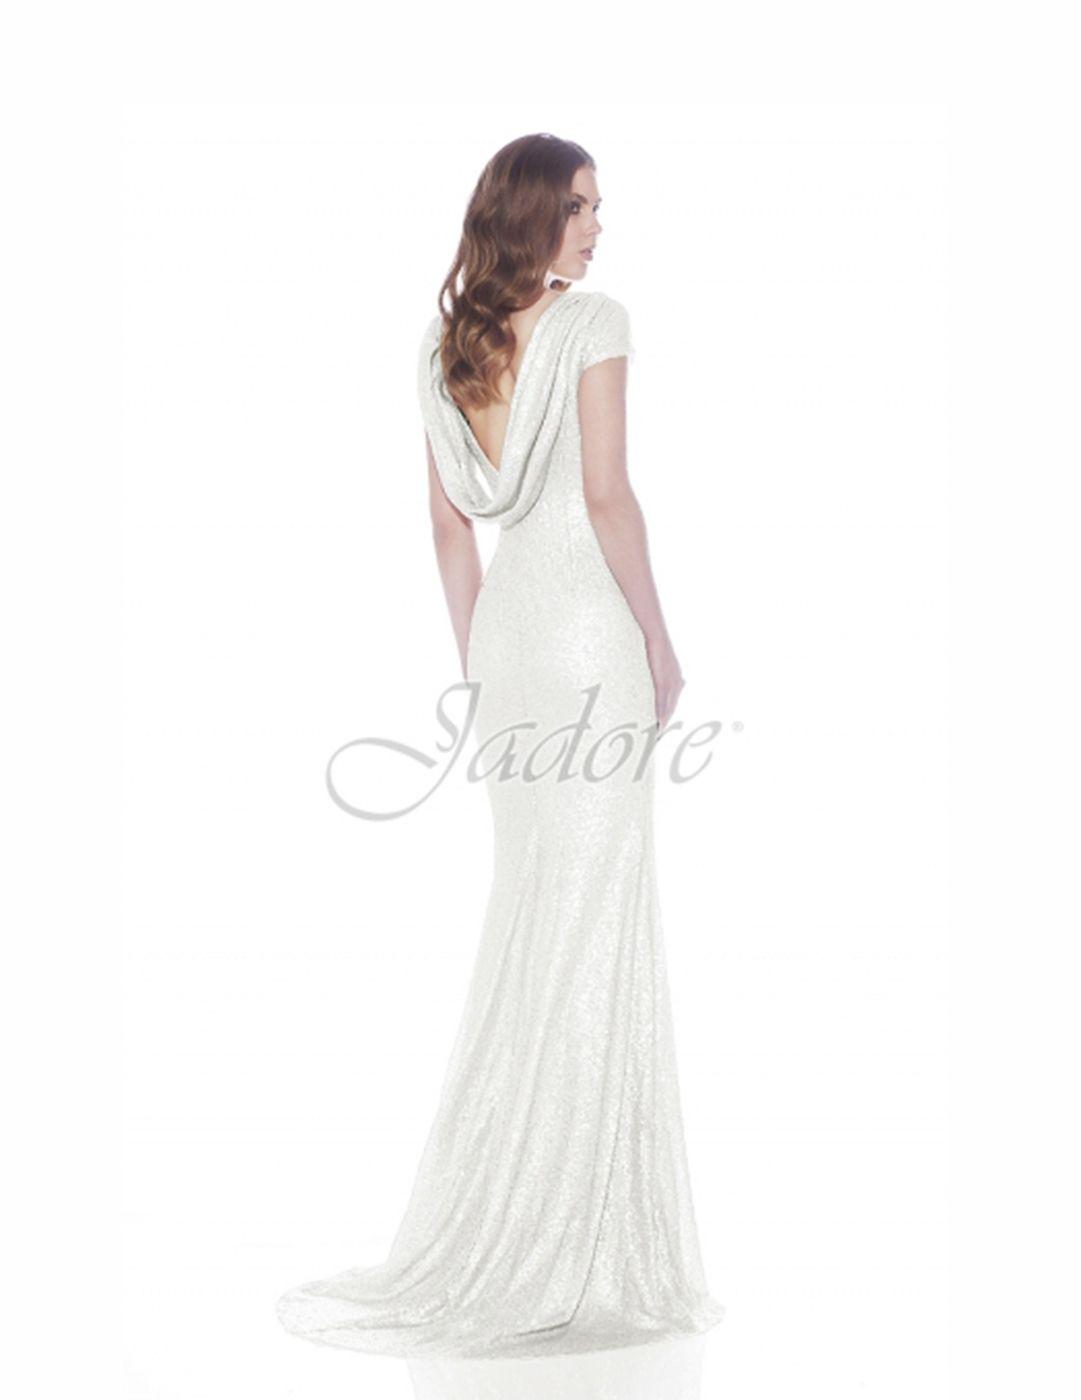 efac3b46301 View Dress - Jadore J7 Collection - J7114